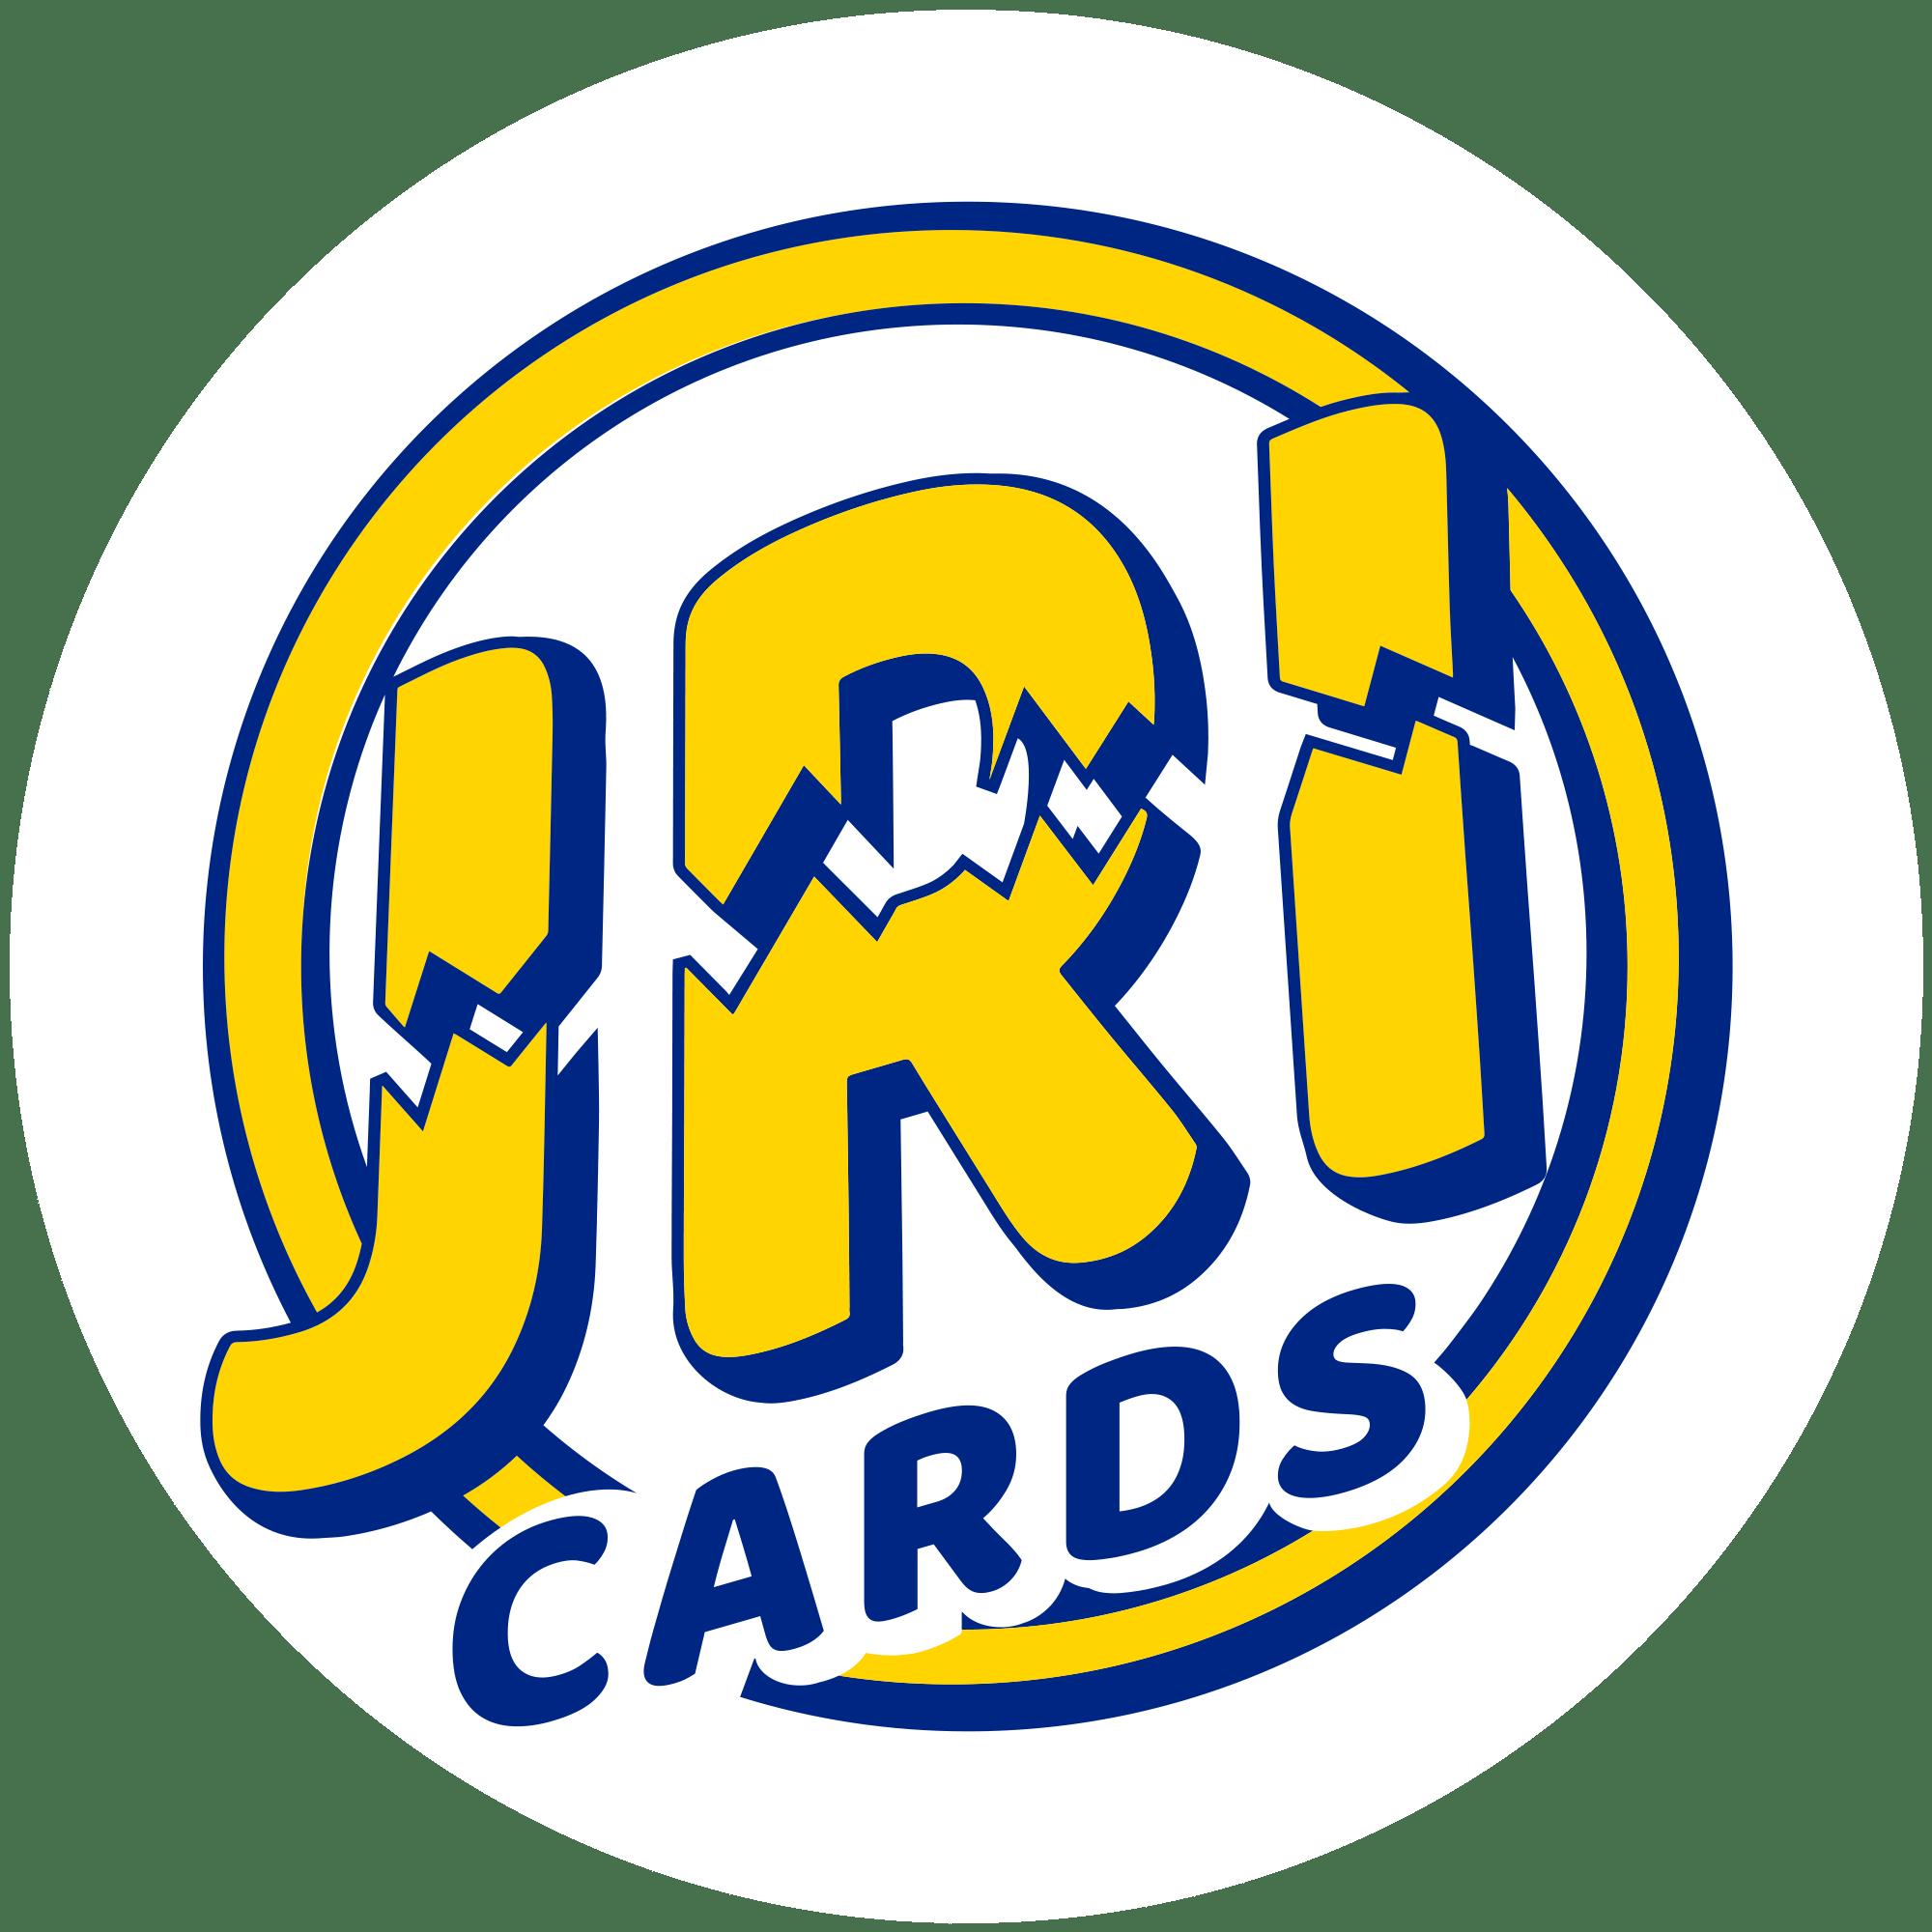 2019 PANINI ILLUSIONS FOOTBALL MEGA BOX (7 PACKS AVAILABLE)